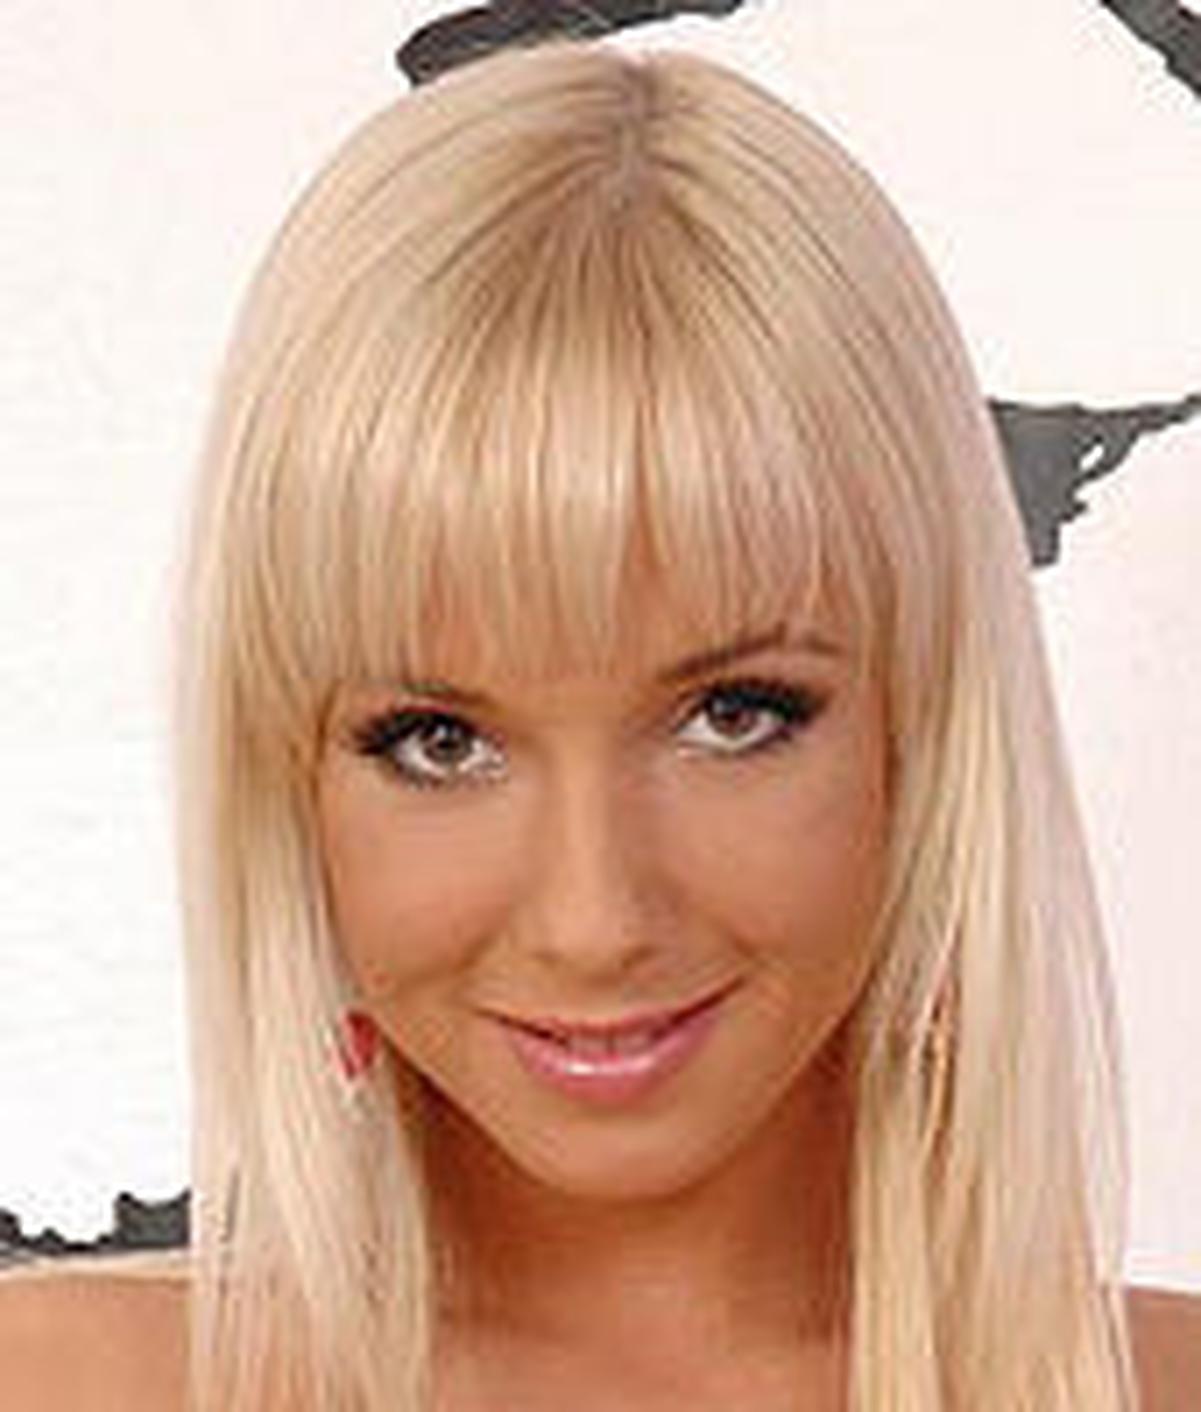 Natali Blond Wiki & Bio - Pornographic Actress